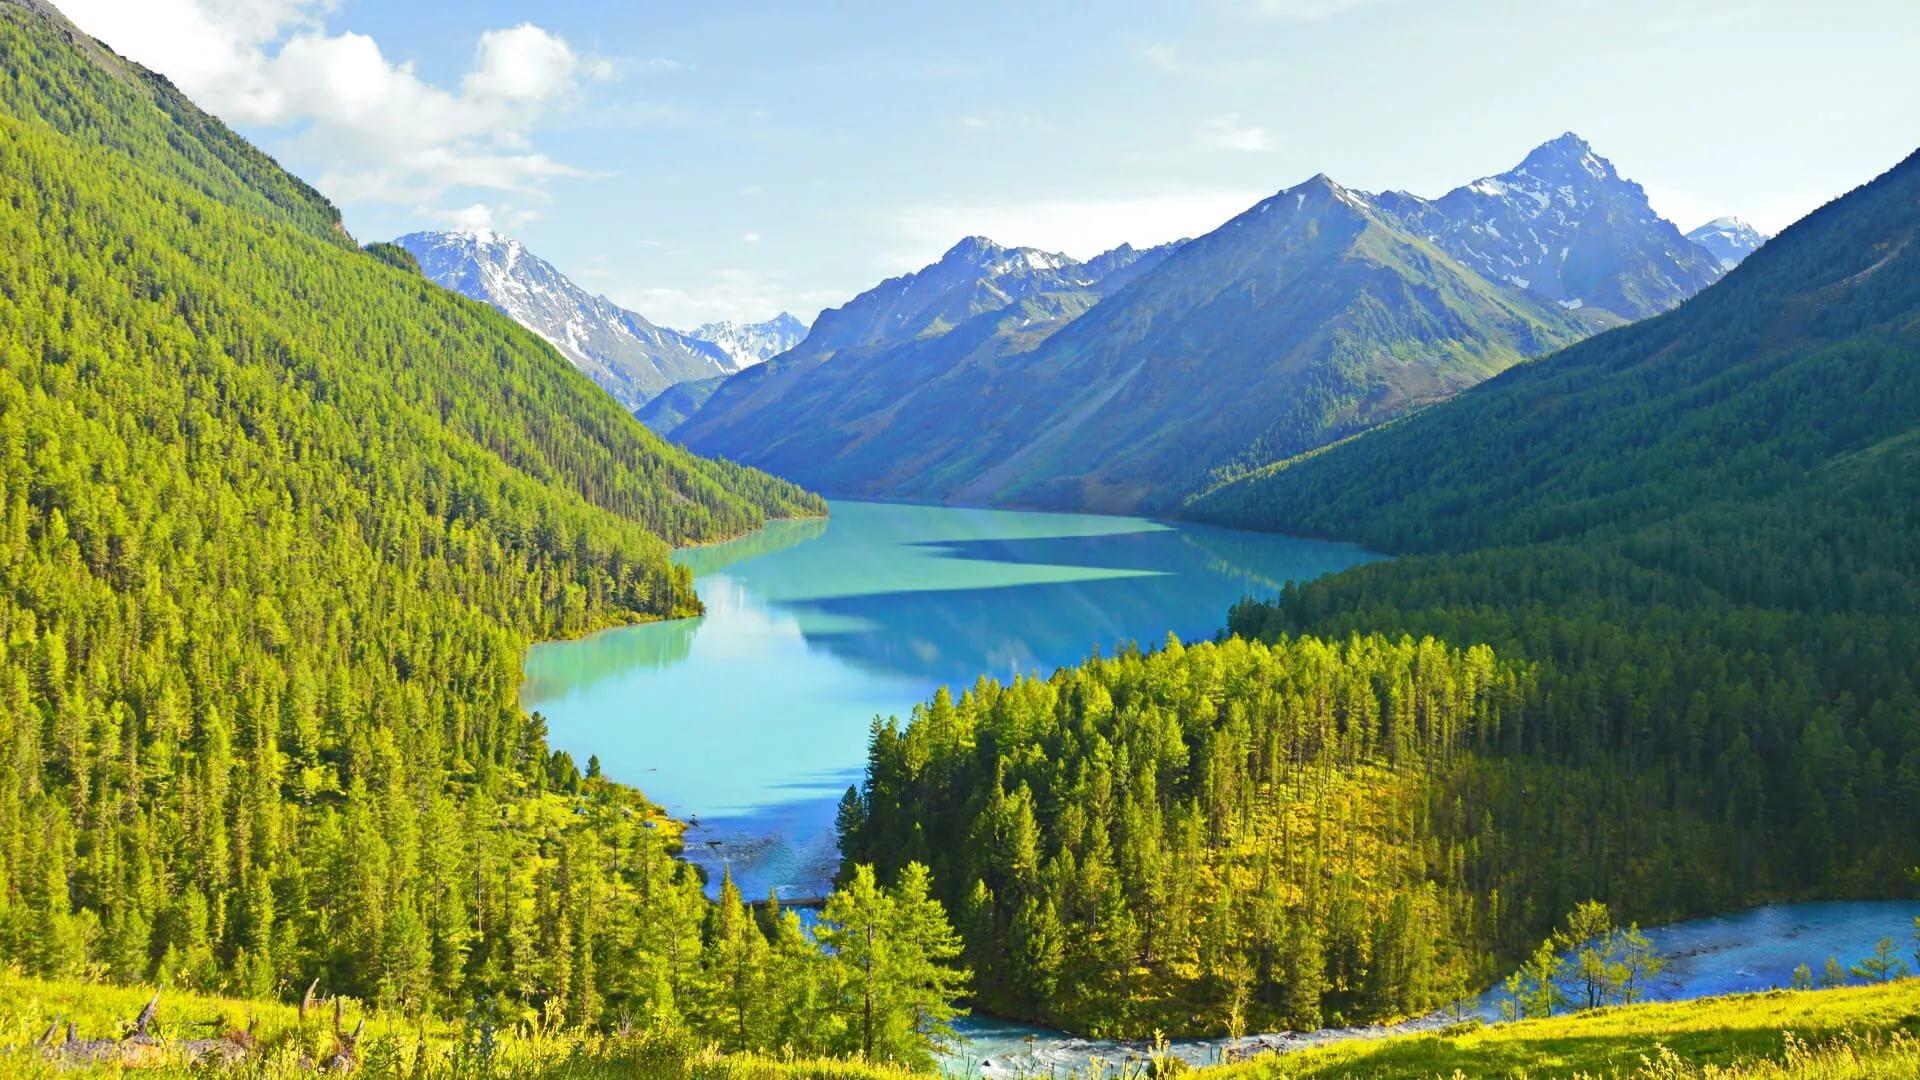 13 1 - 10 locais no Altay que vale a pena visitar